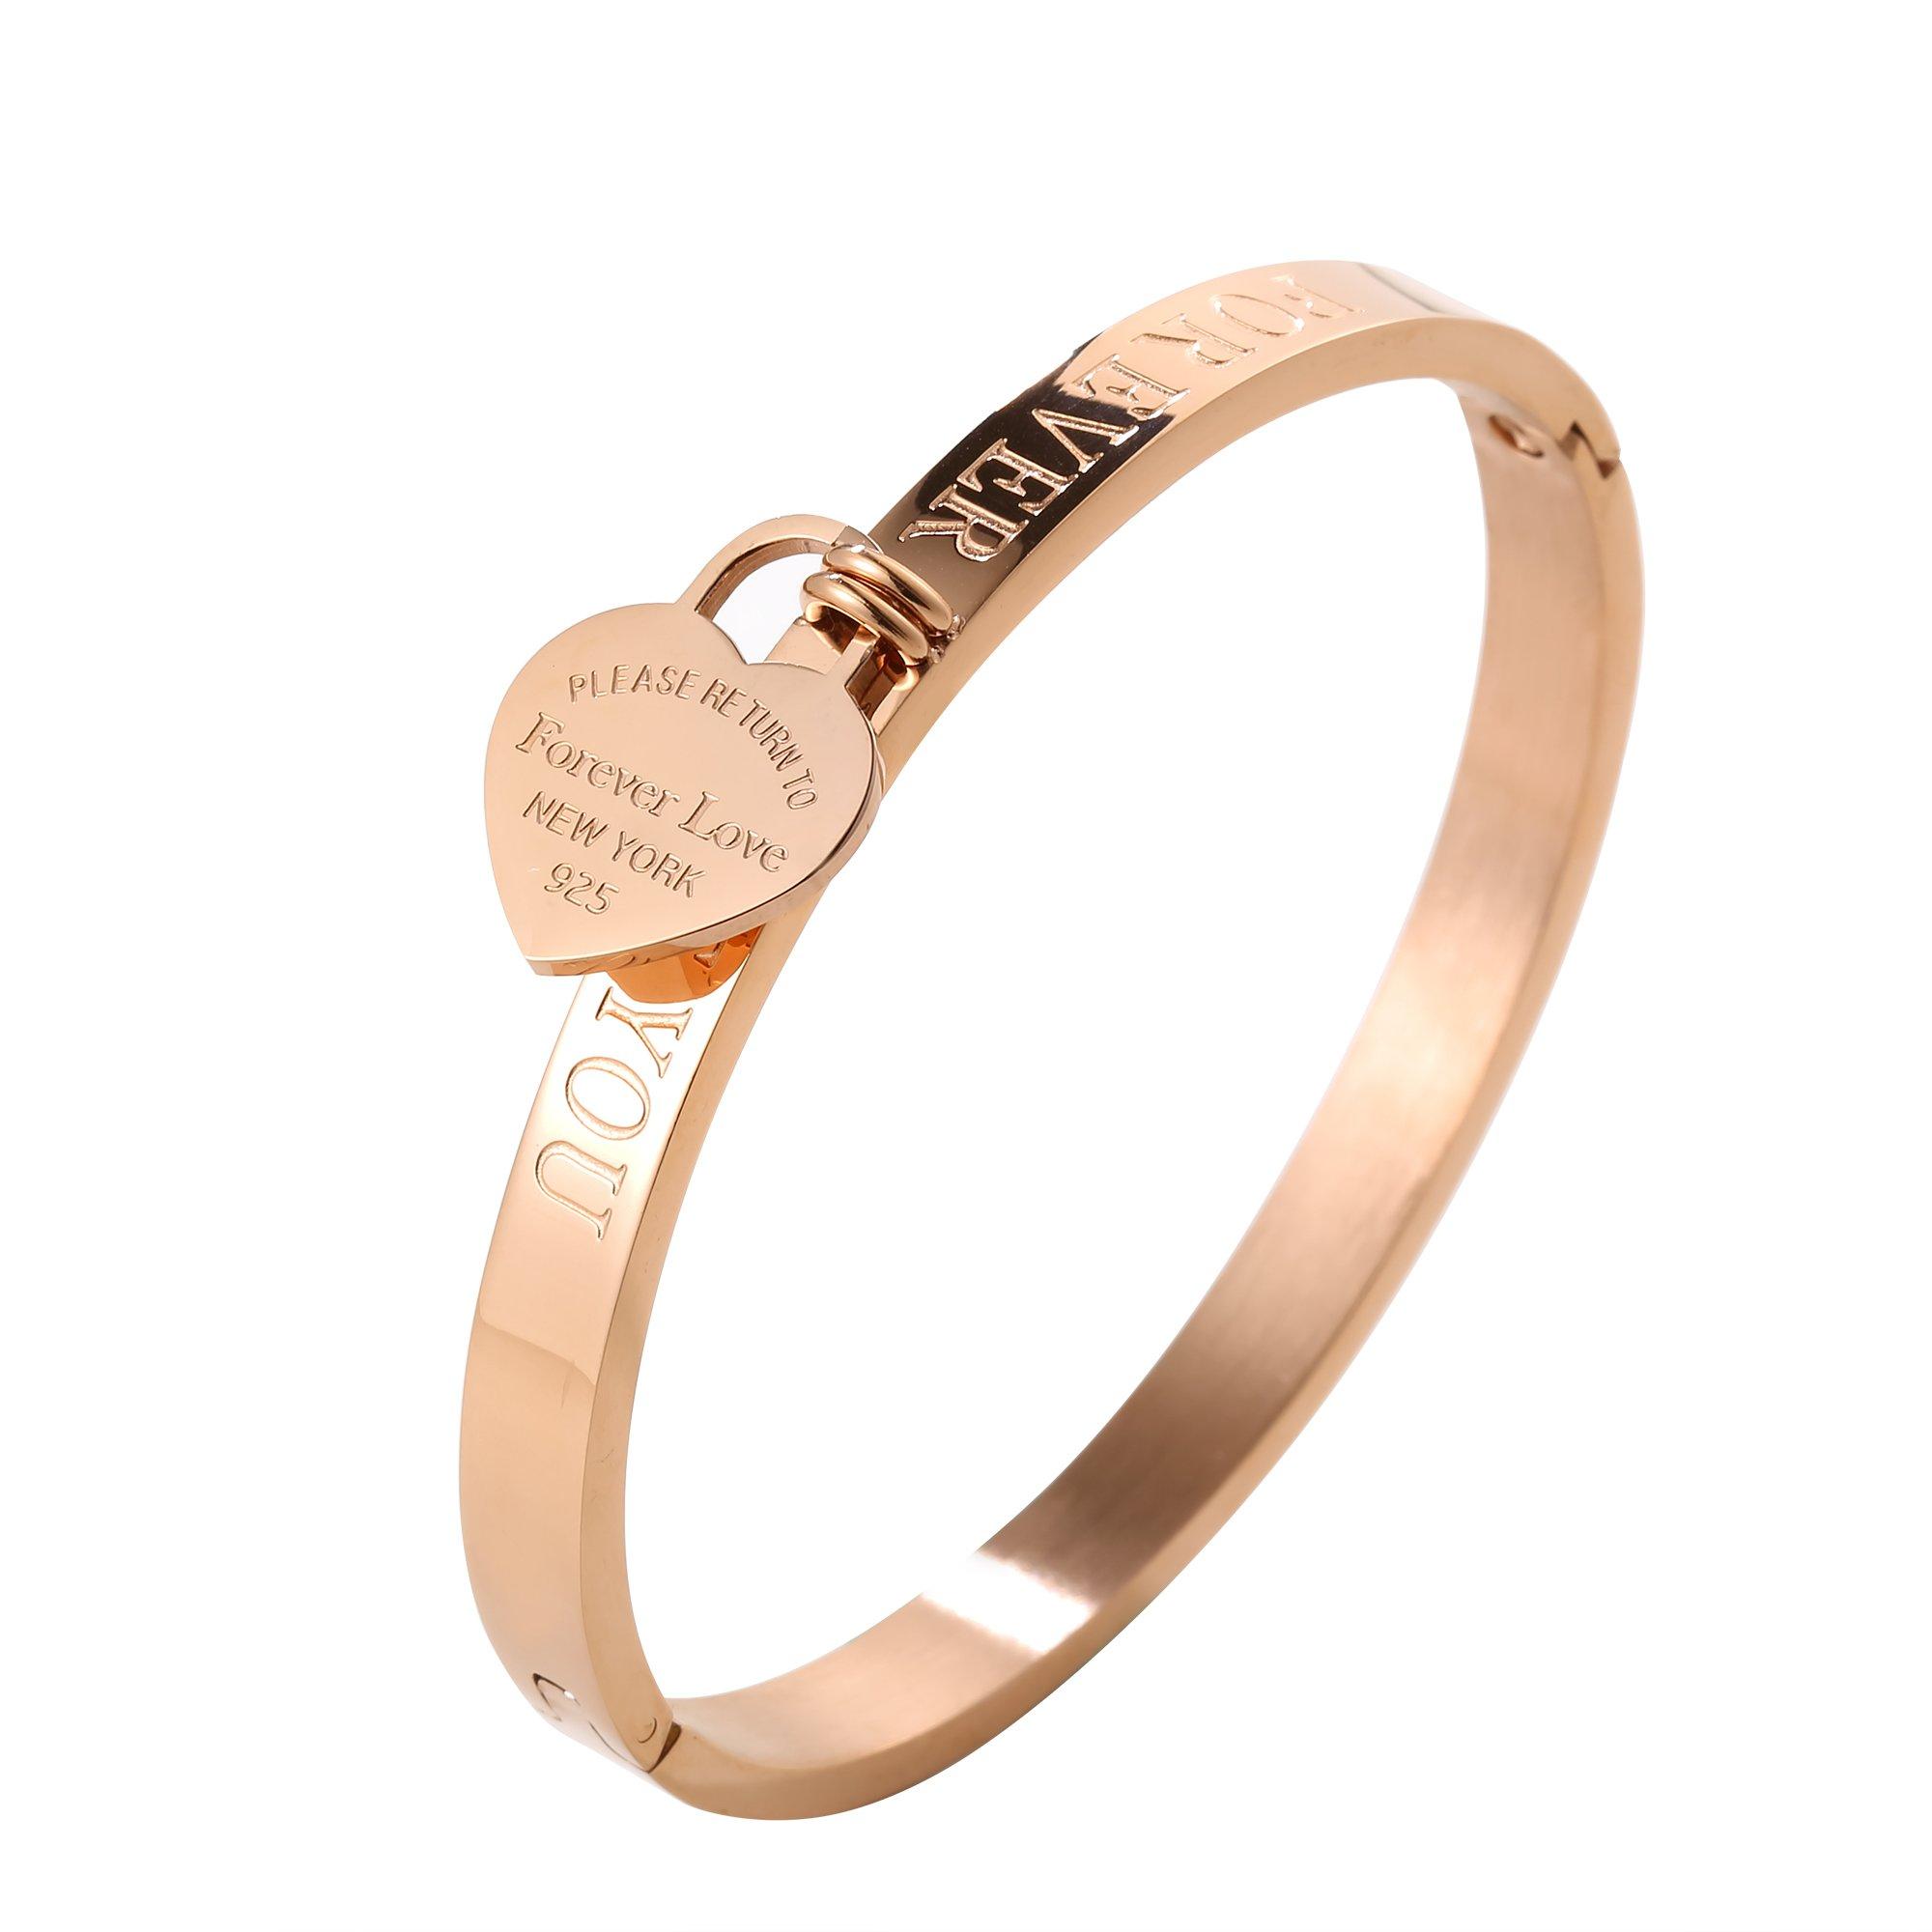 JINHUI ❤Forever Love Gift Jewelry 18 K Rose Gold/Gold Bangle Bracelet Heart Pendant Forever Love Letters Engraved Bangle Bracelet for Women Size 6.5'' (Rose Gold)